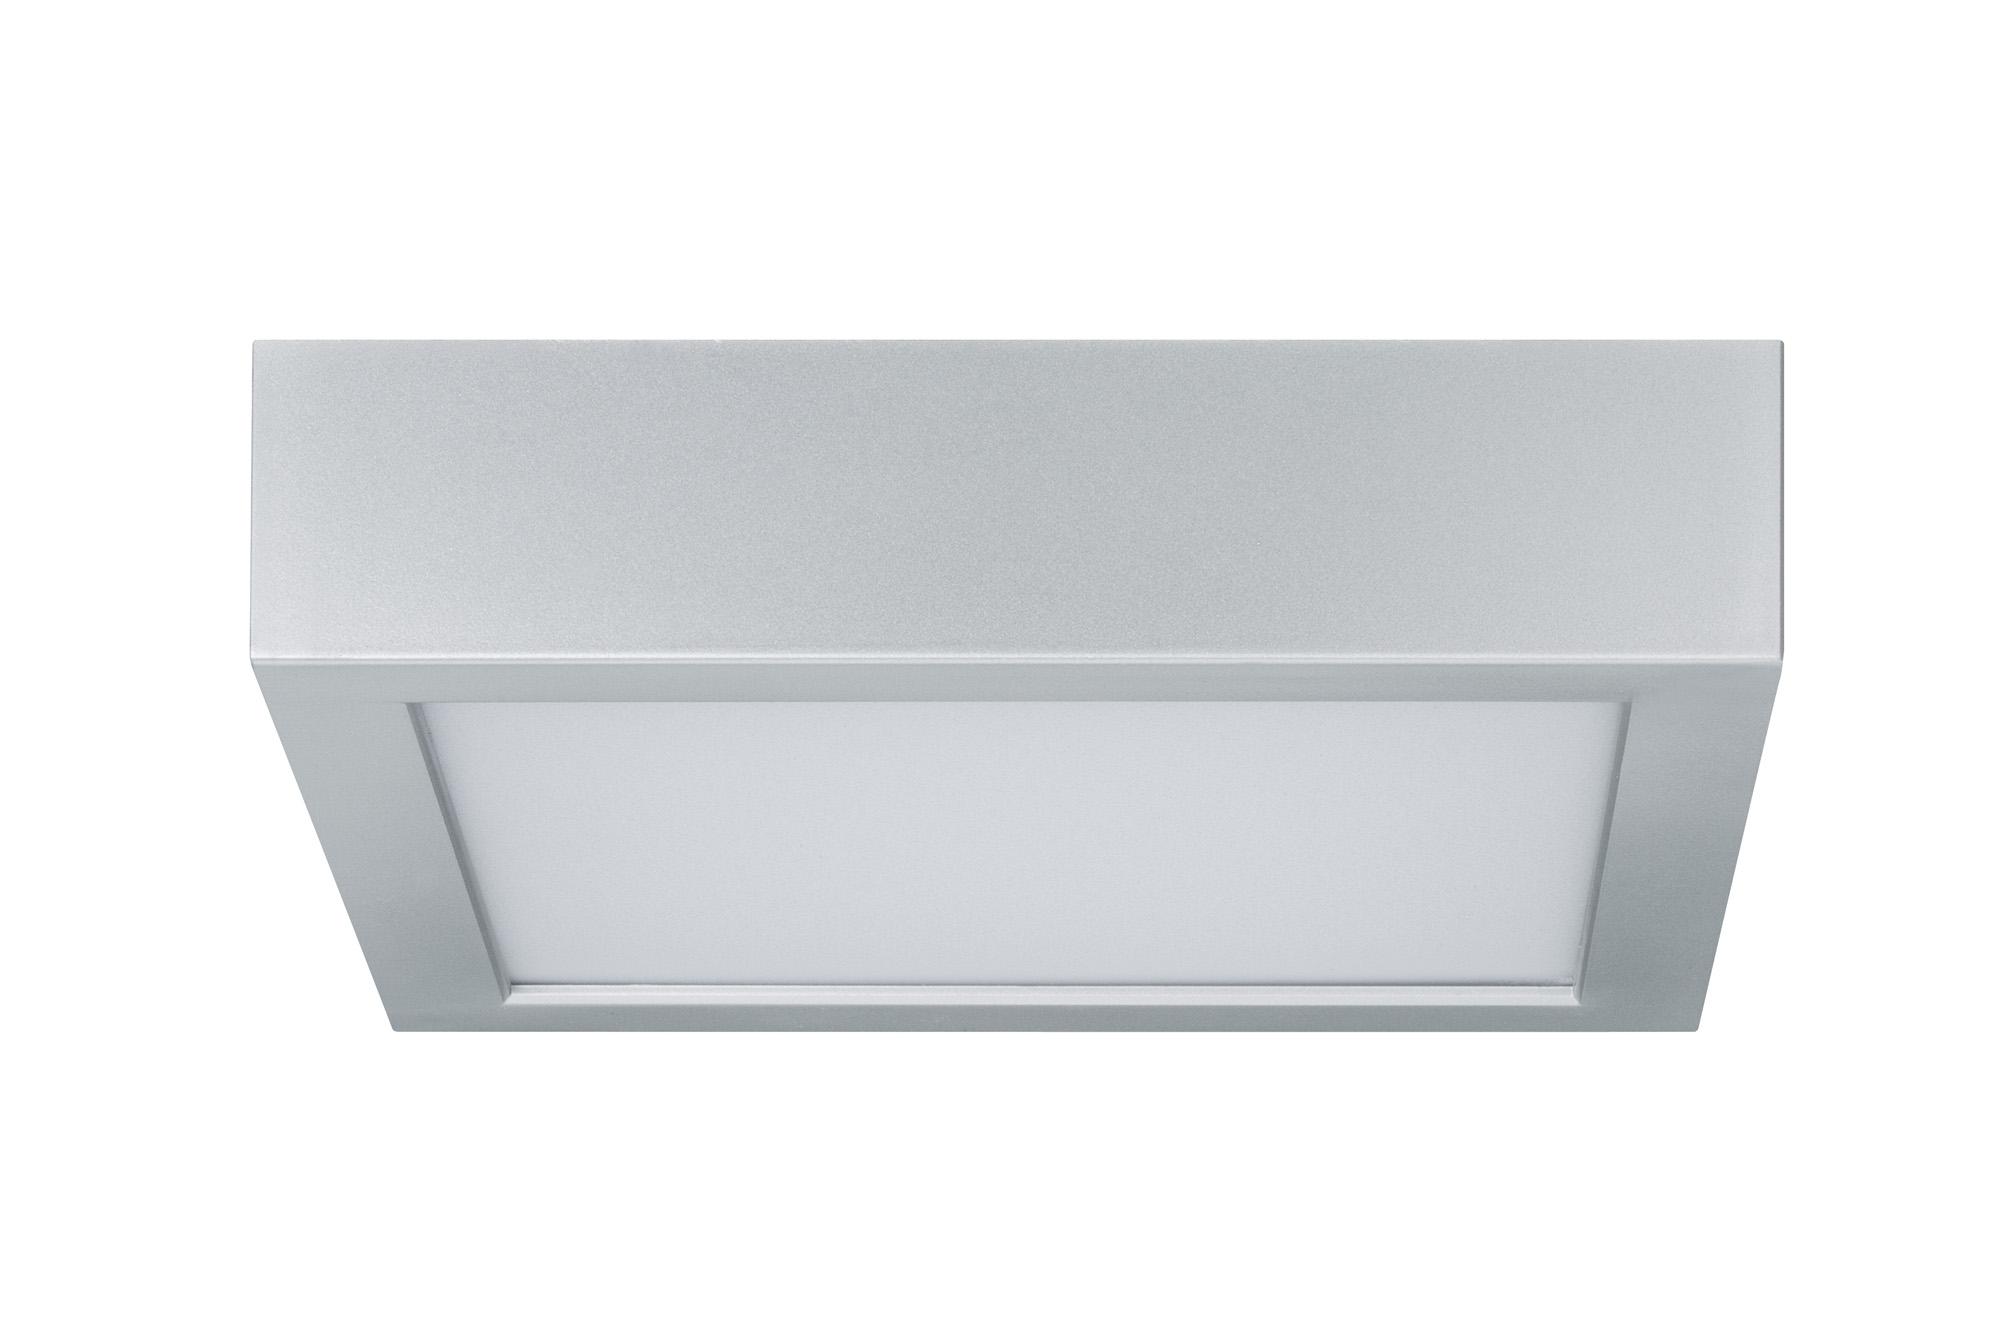 lichtideen l35235 led panel deckenleuchte space gro. Black Bedroom Furniture Sets. Home Design Ideas